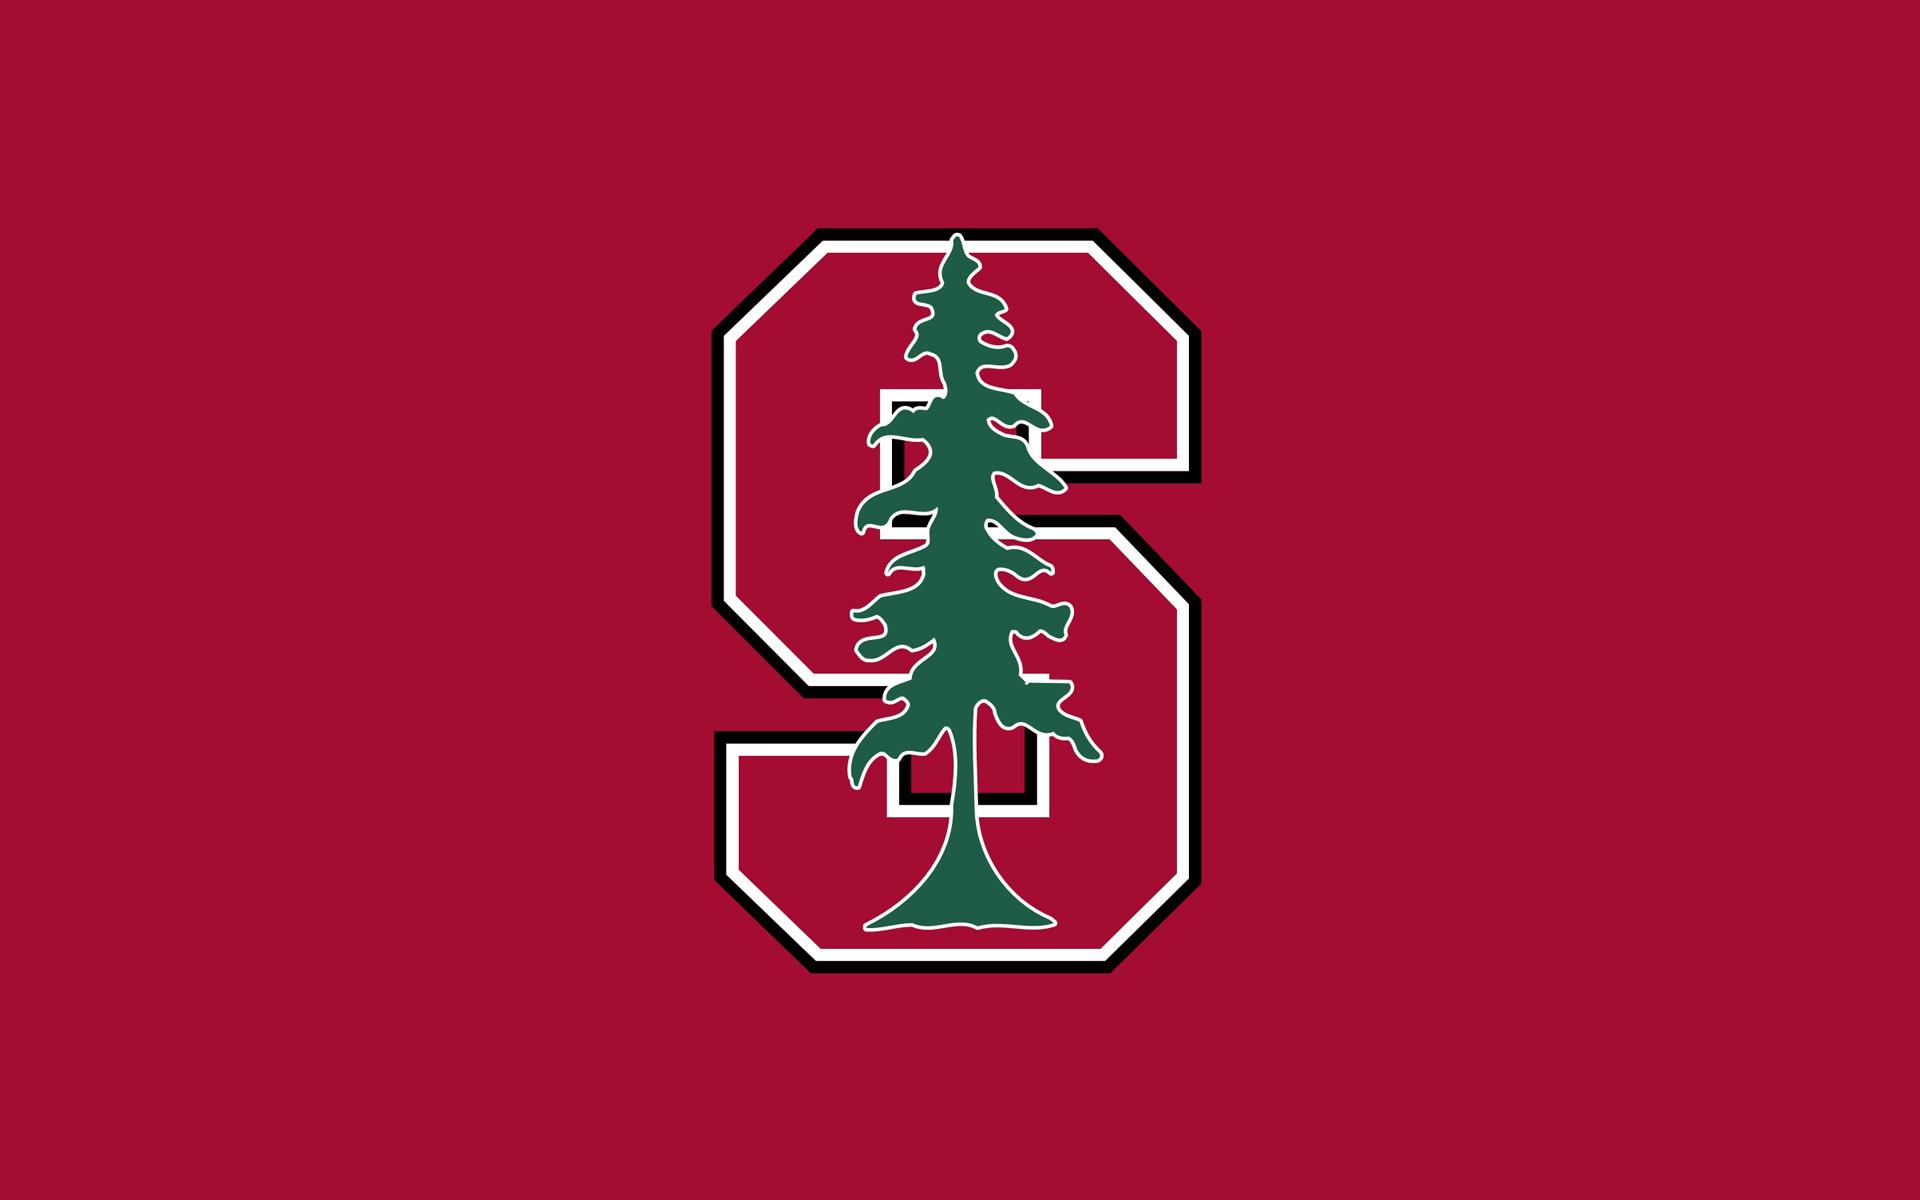 Stanford University Tree Logo Red wallpaper background 1920x1200